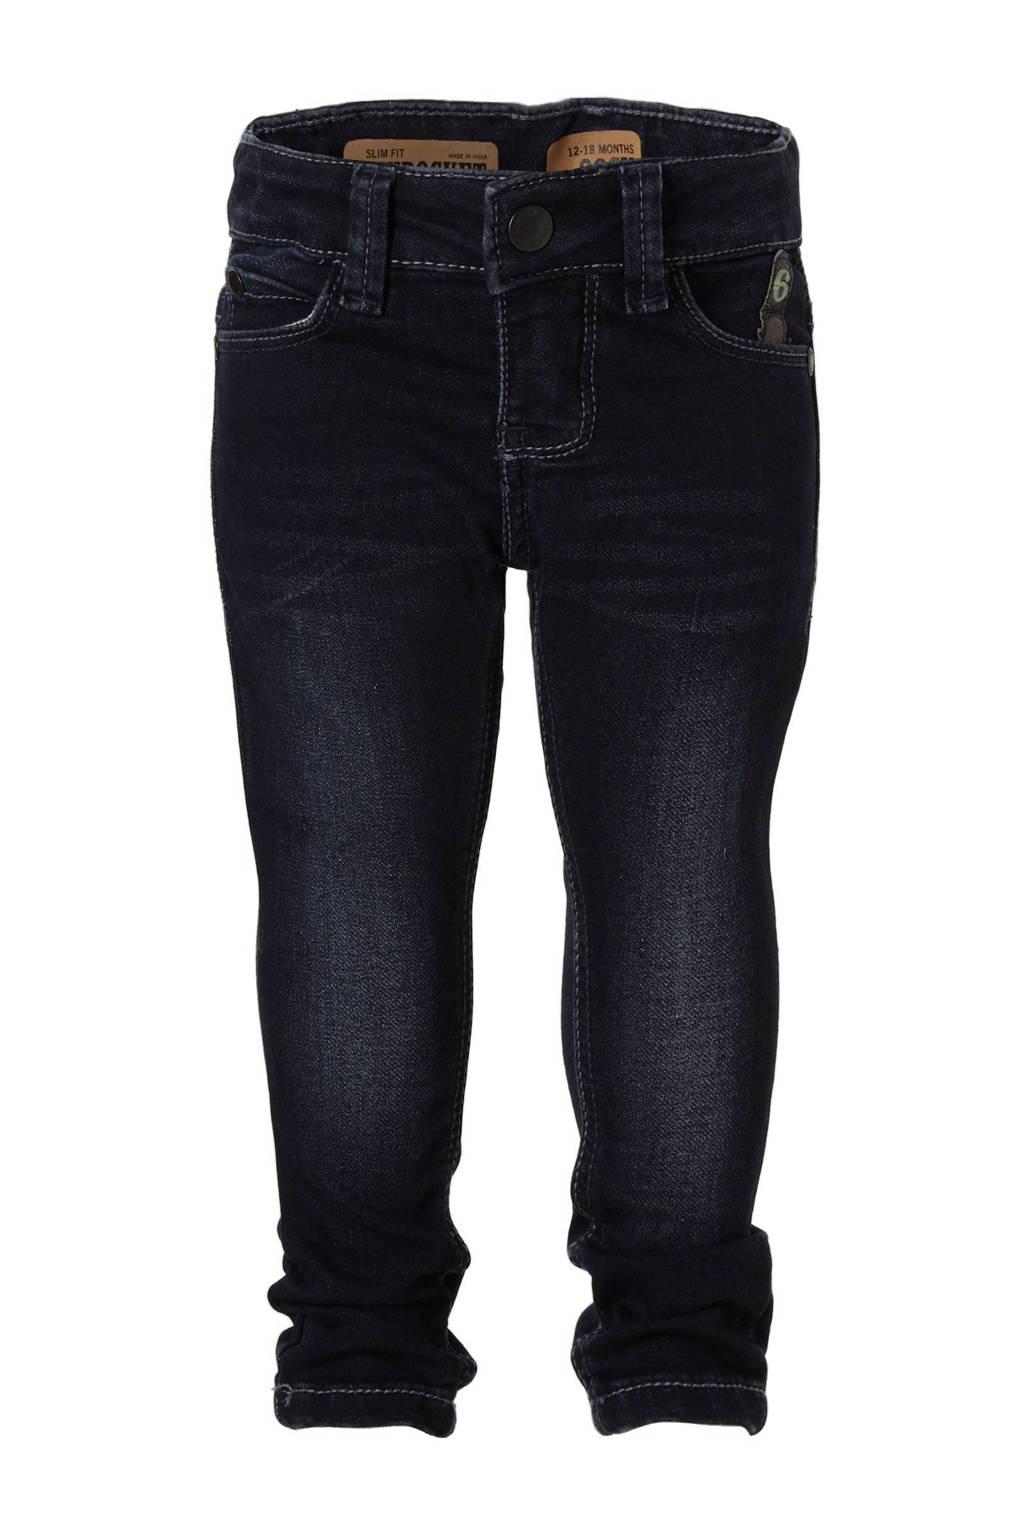 IMPS&ELFS slim fit jeans, stone dark